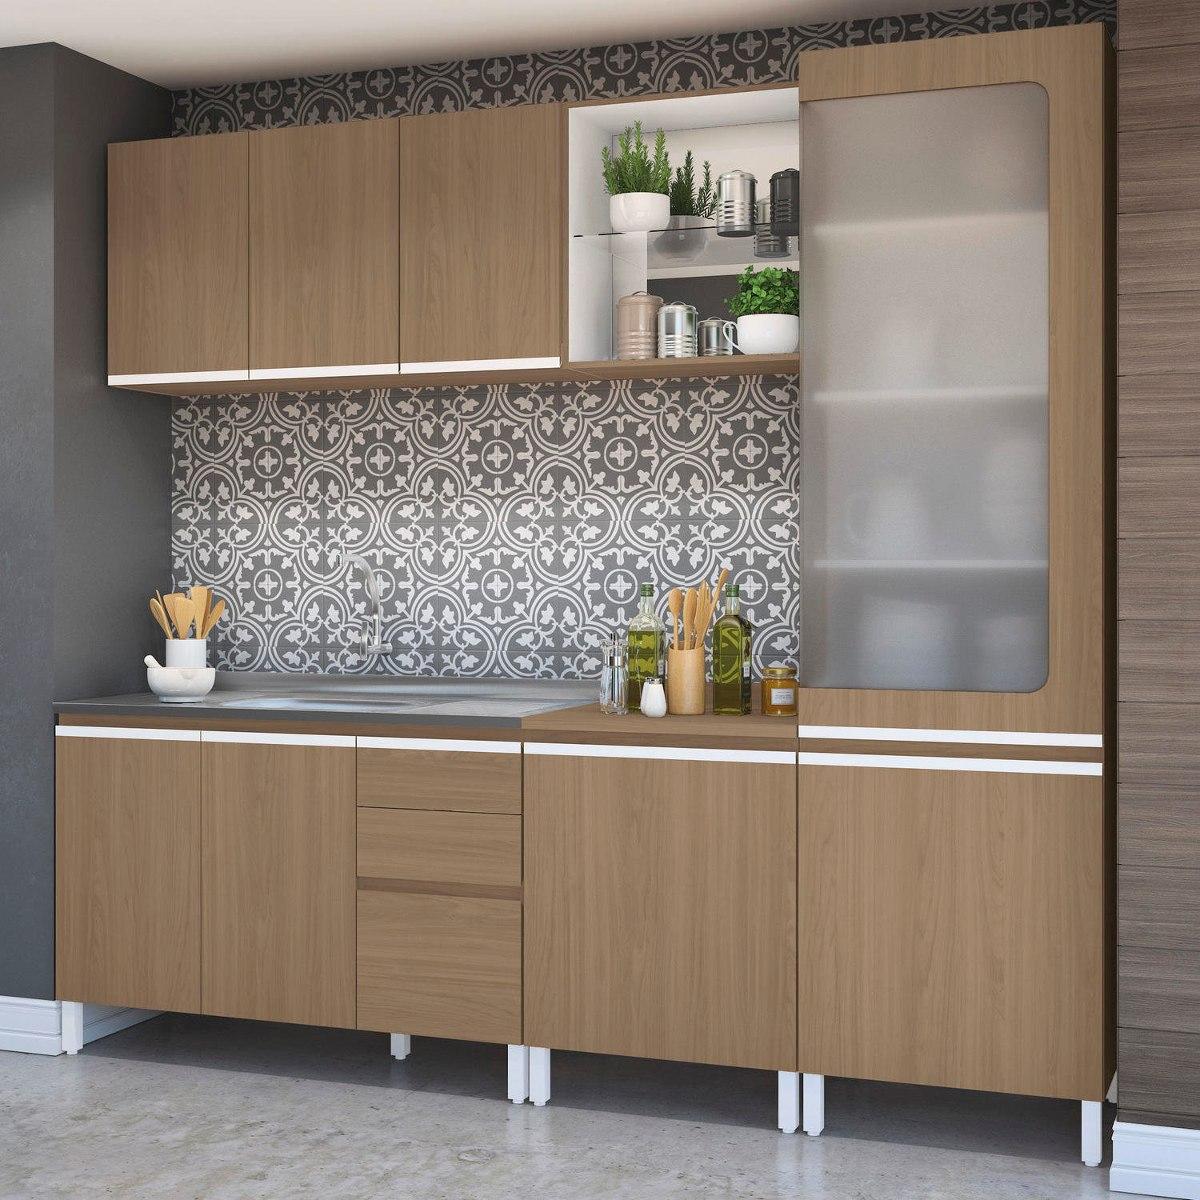 Cozinha Compacta New Urban Cb172 Kappesberg Hi R 1 699 90 Em